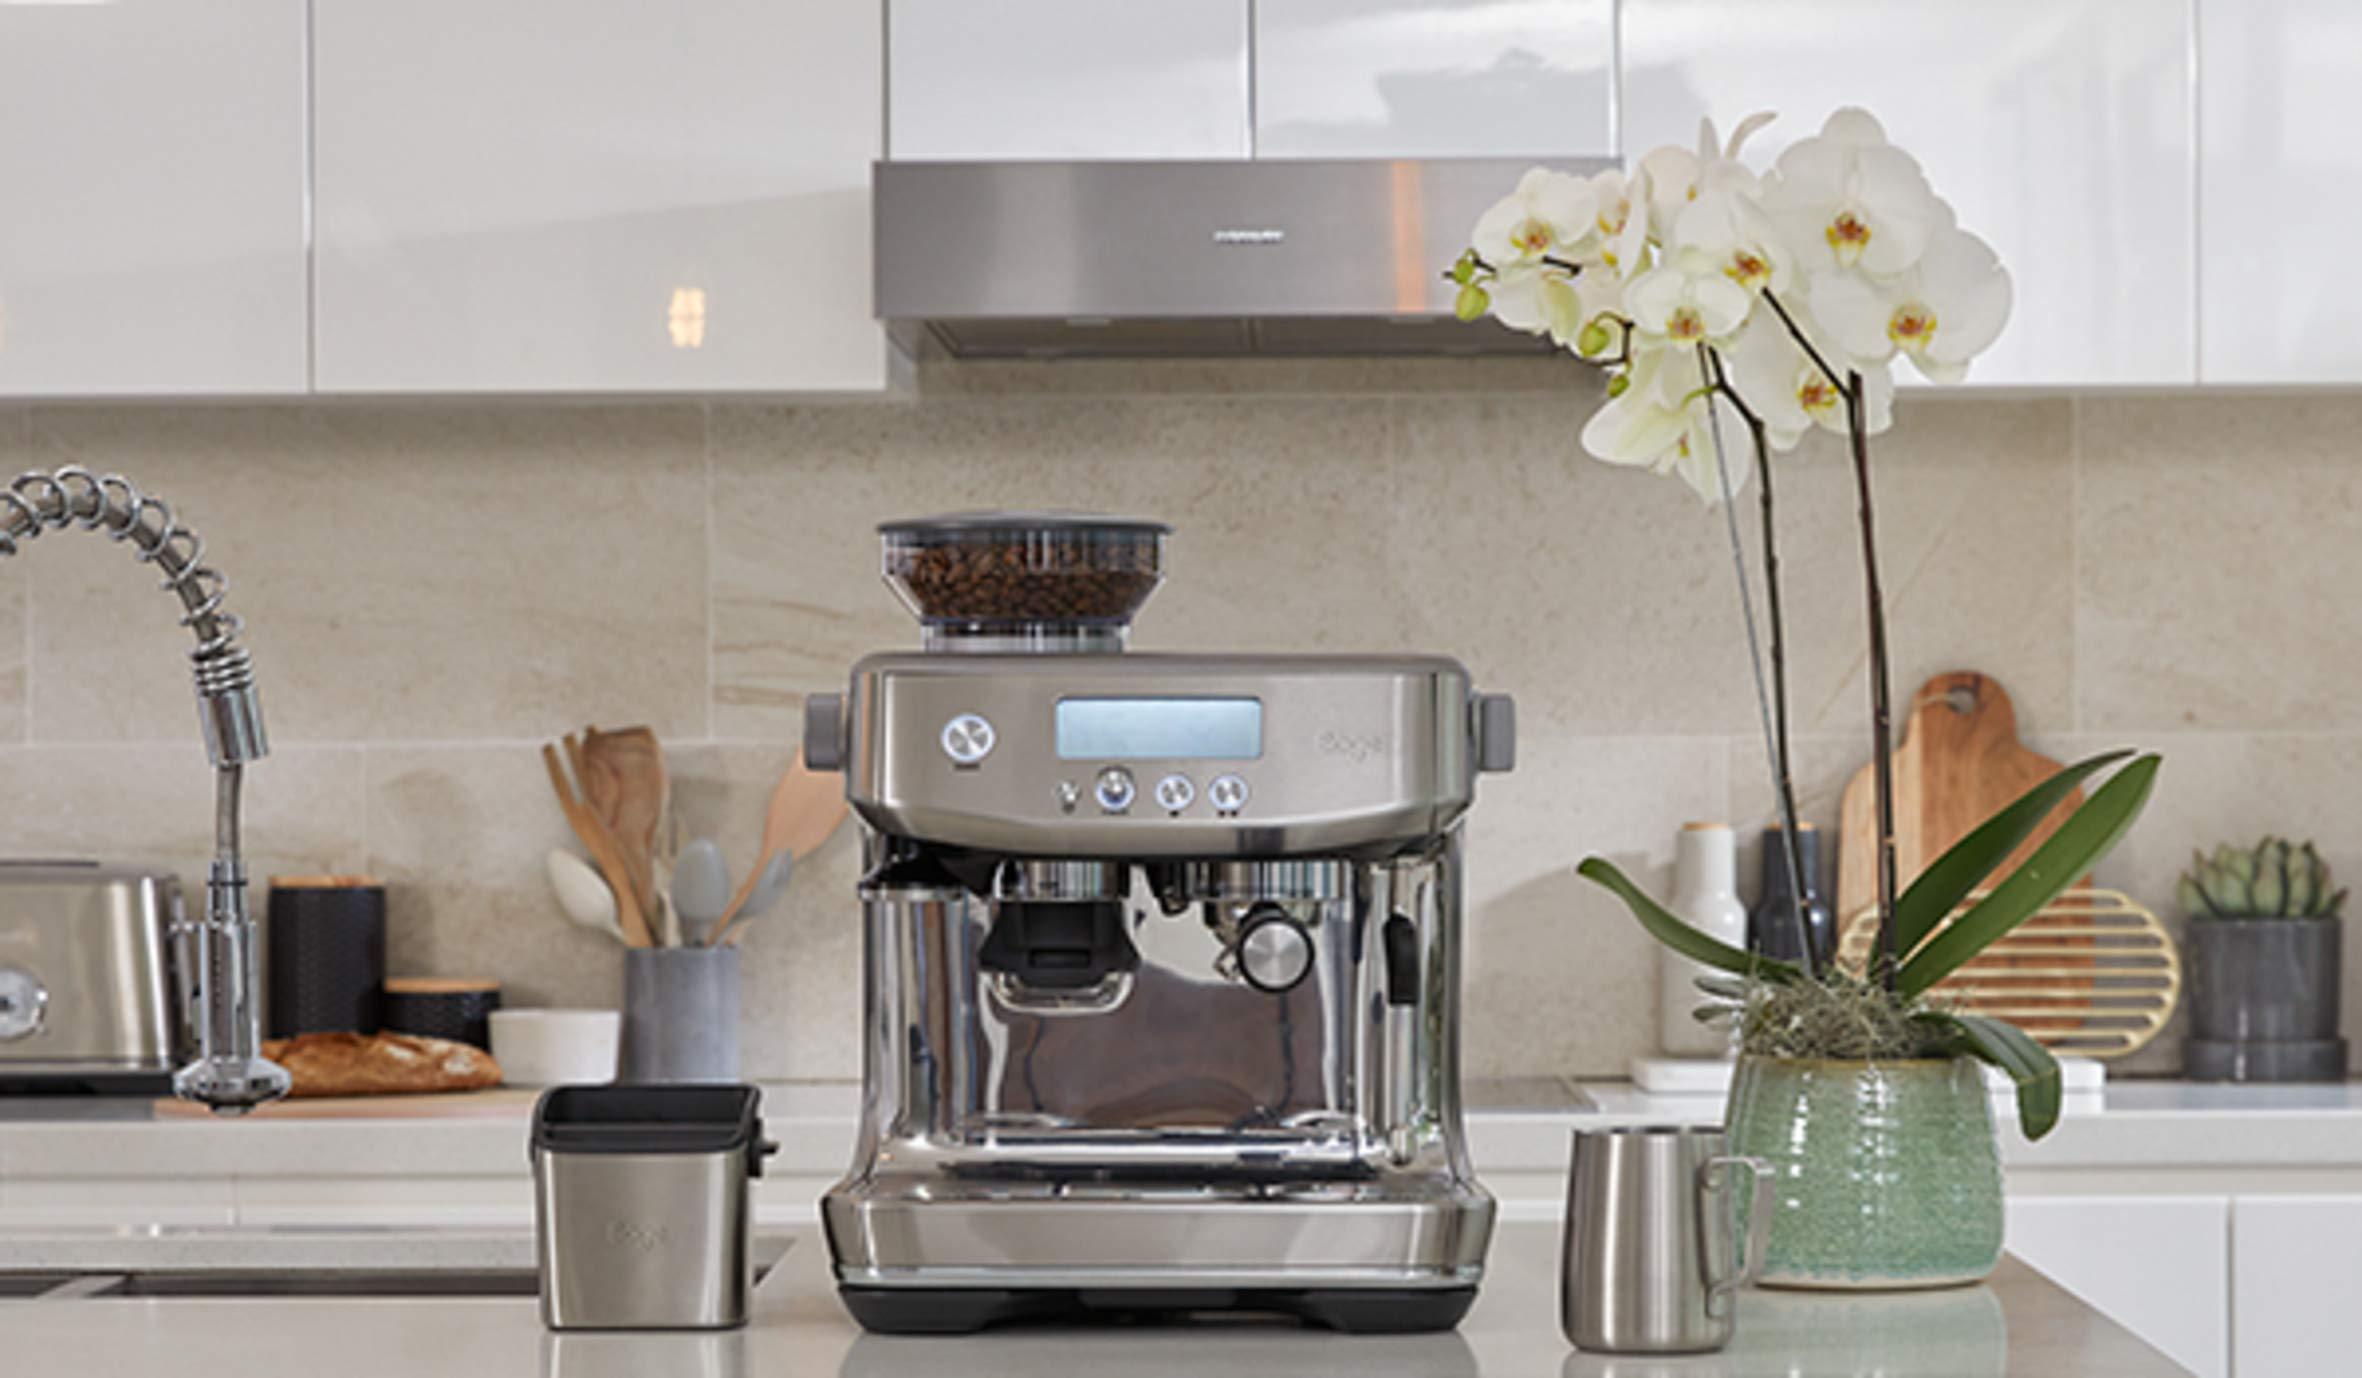 Sage SES875BKS The Barista Express Machine, Black Sesame & BES100GBUK the Knock Box Mini Coffee Grind Bin, Silver